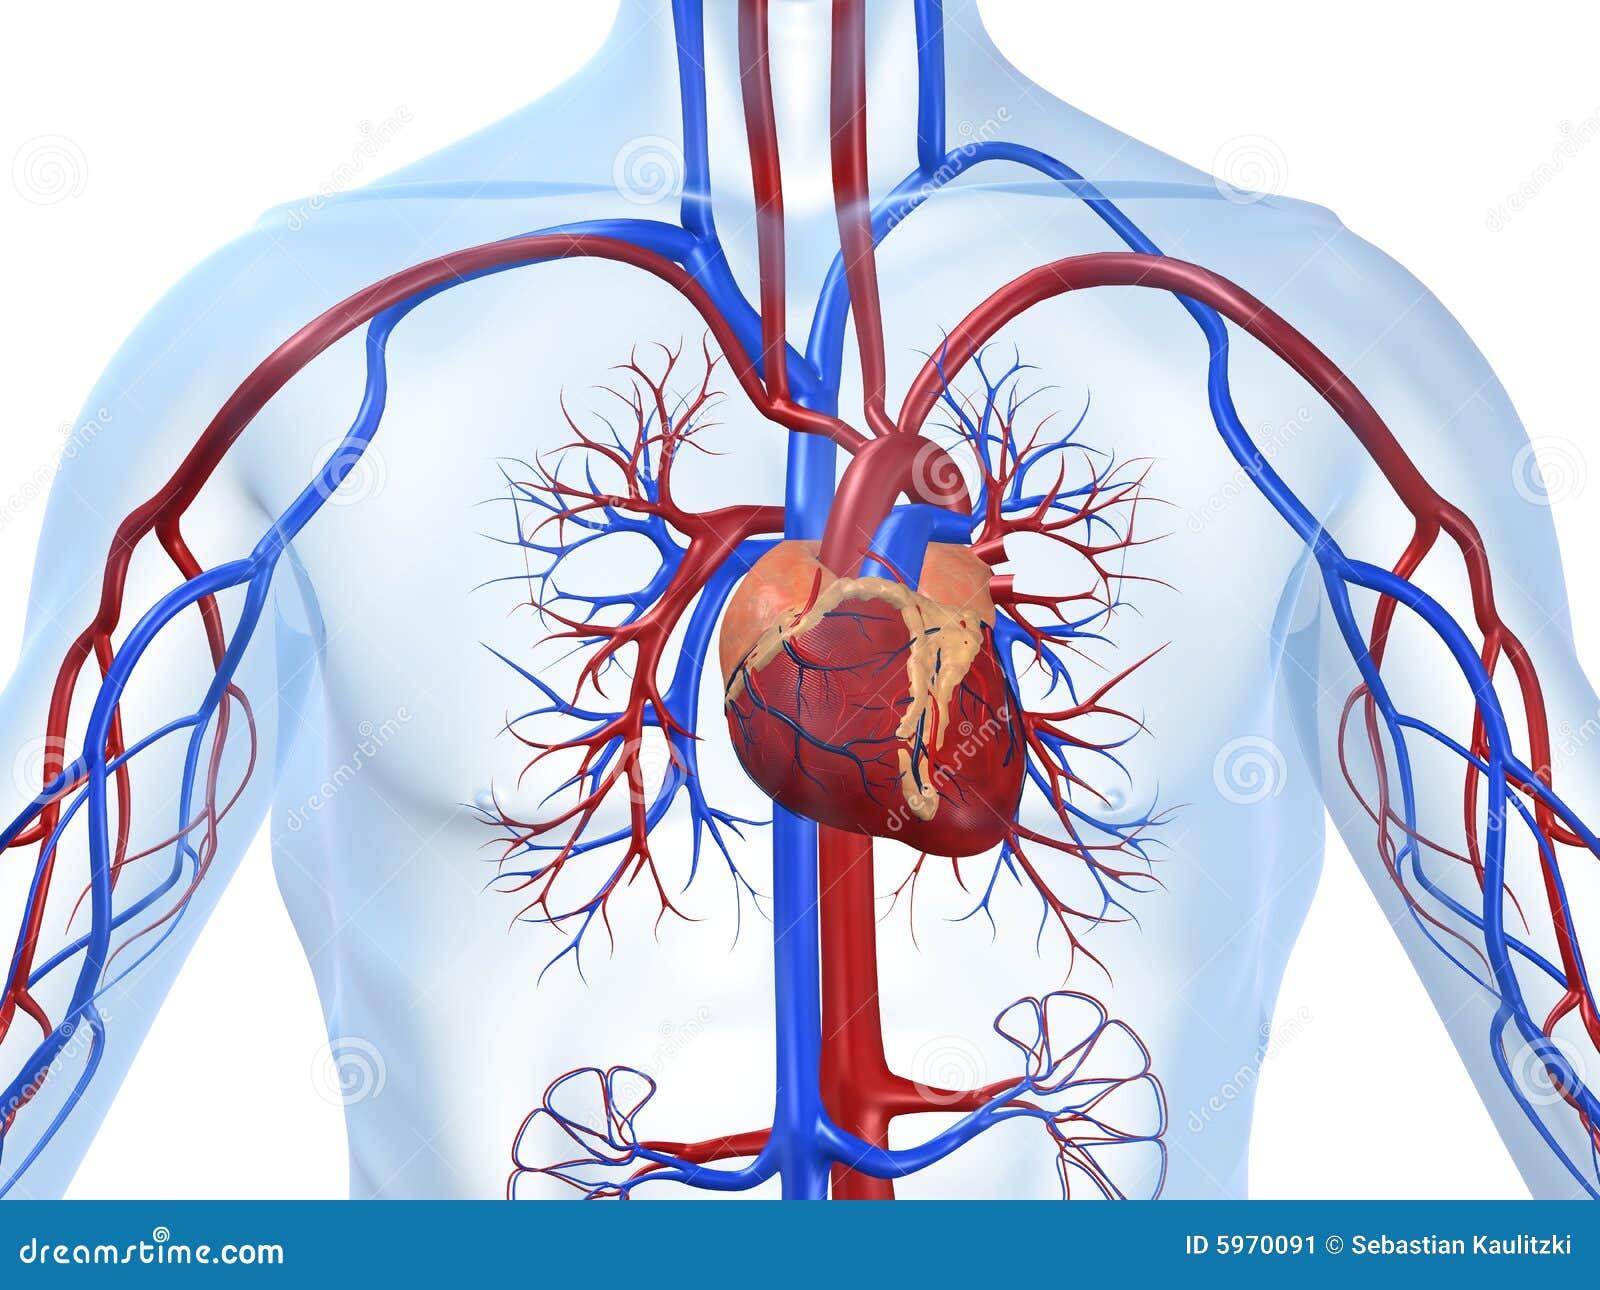 Cardiovascular system stock illustration. Illustration of design ...